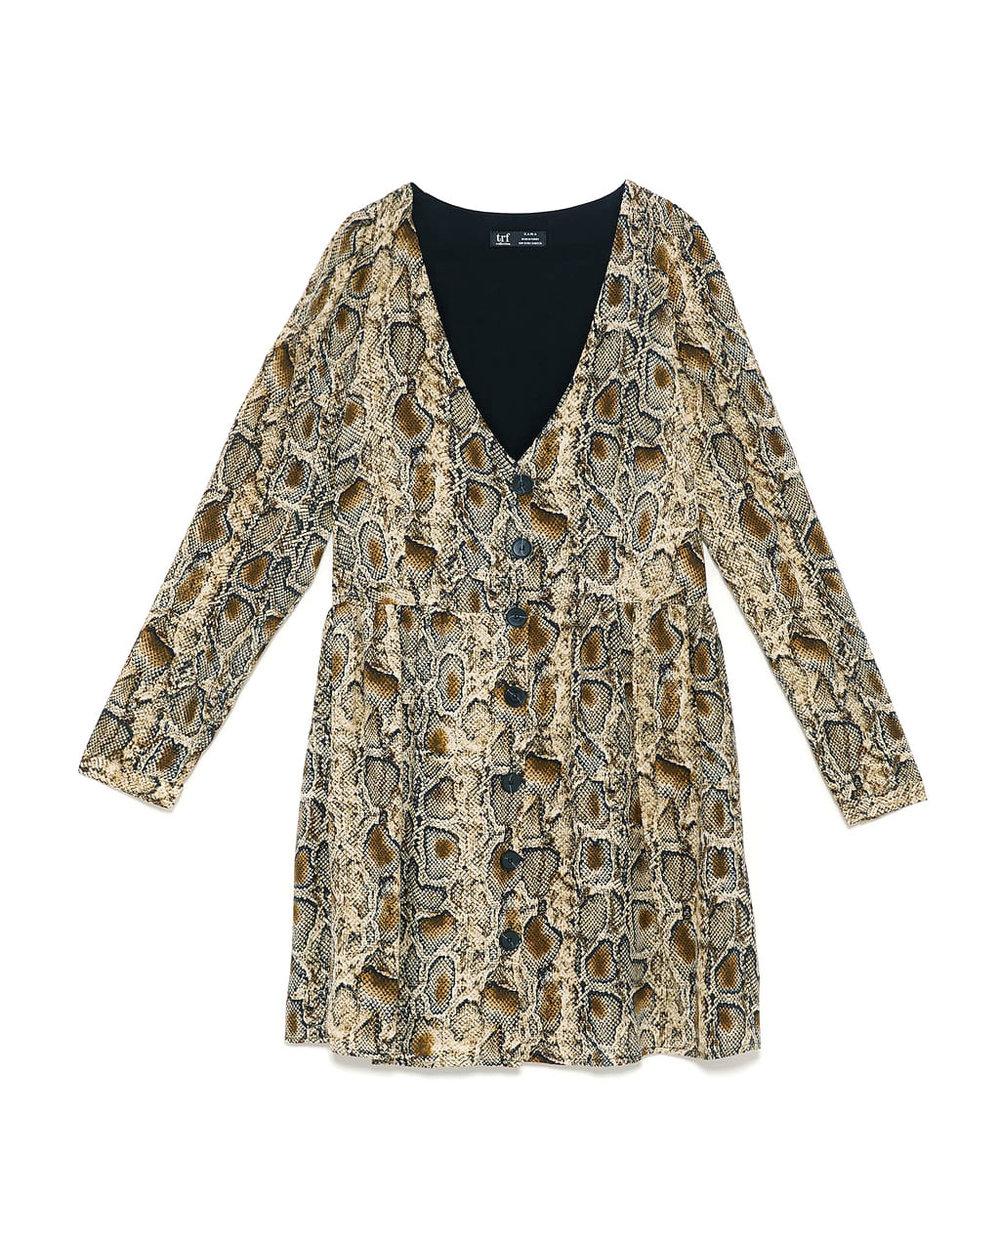 Zara Snakeskin Print Dress     $15.99